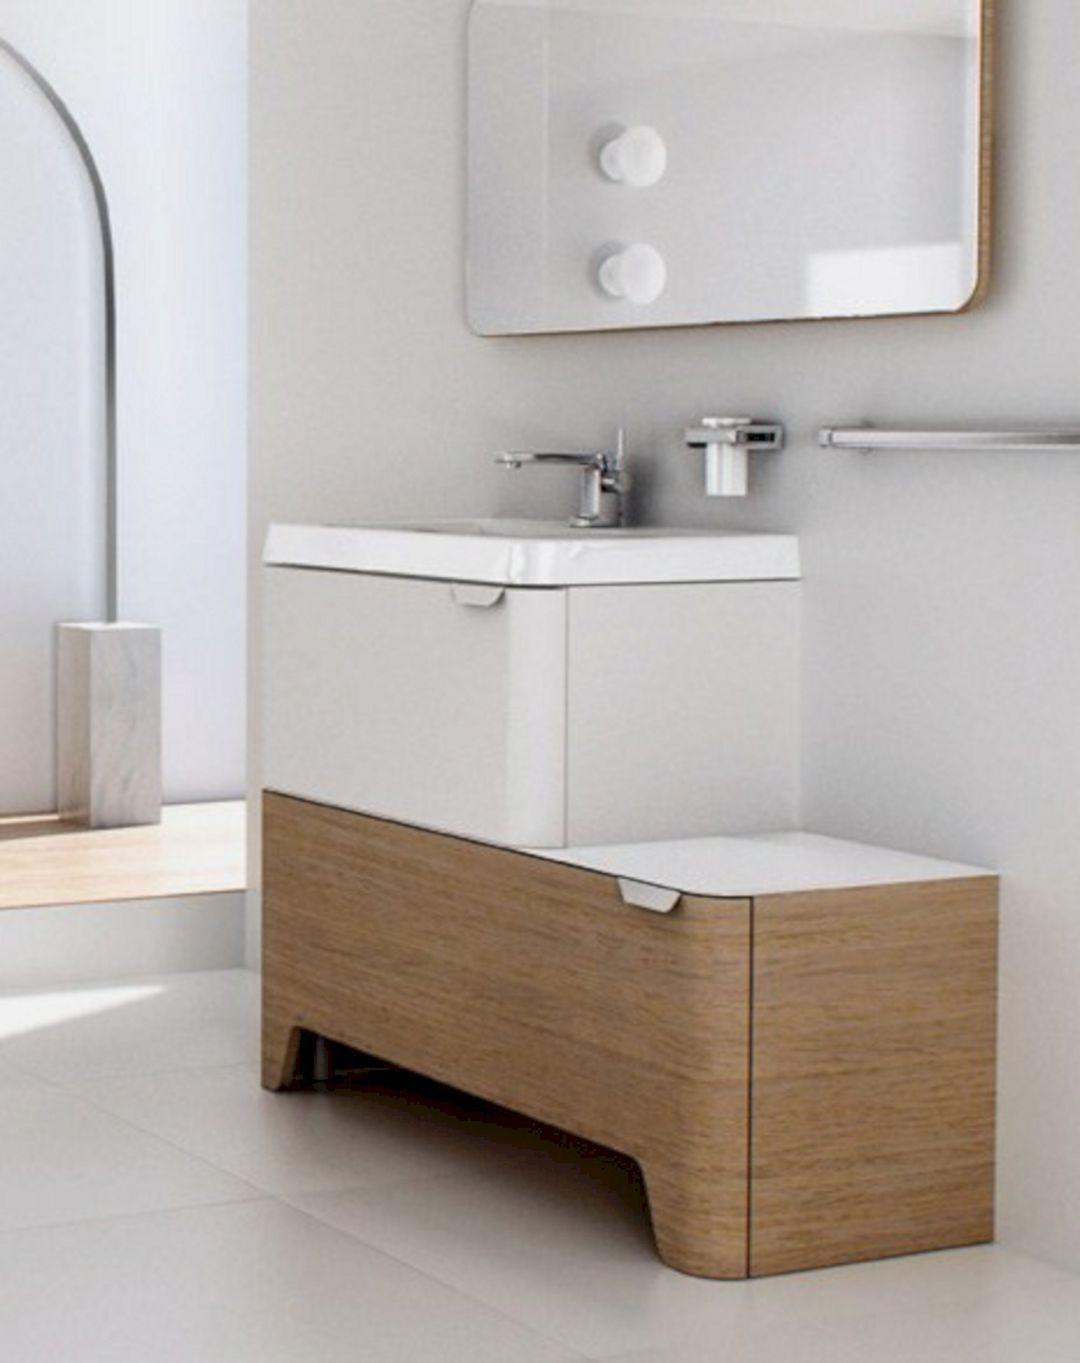 22 unique bathroom vanities design ideas you never seen before | bathroom ideas | bathroom